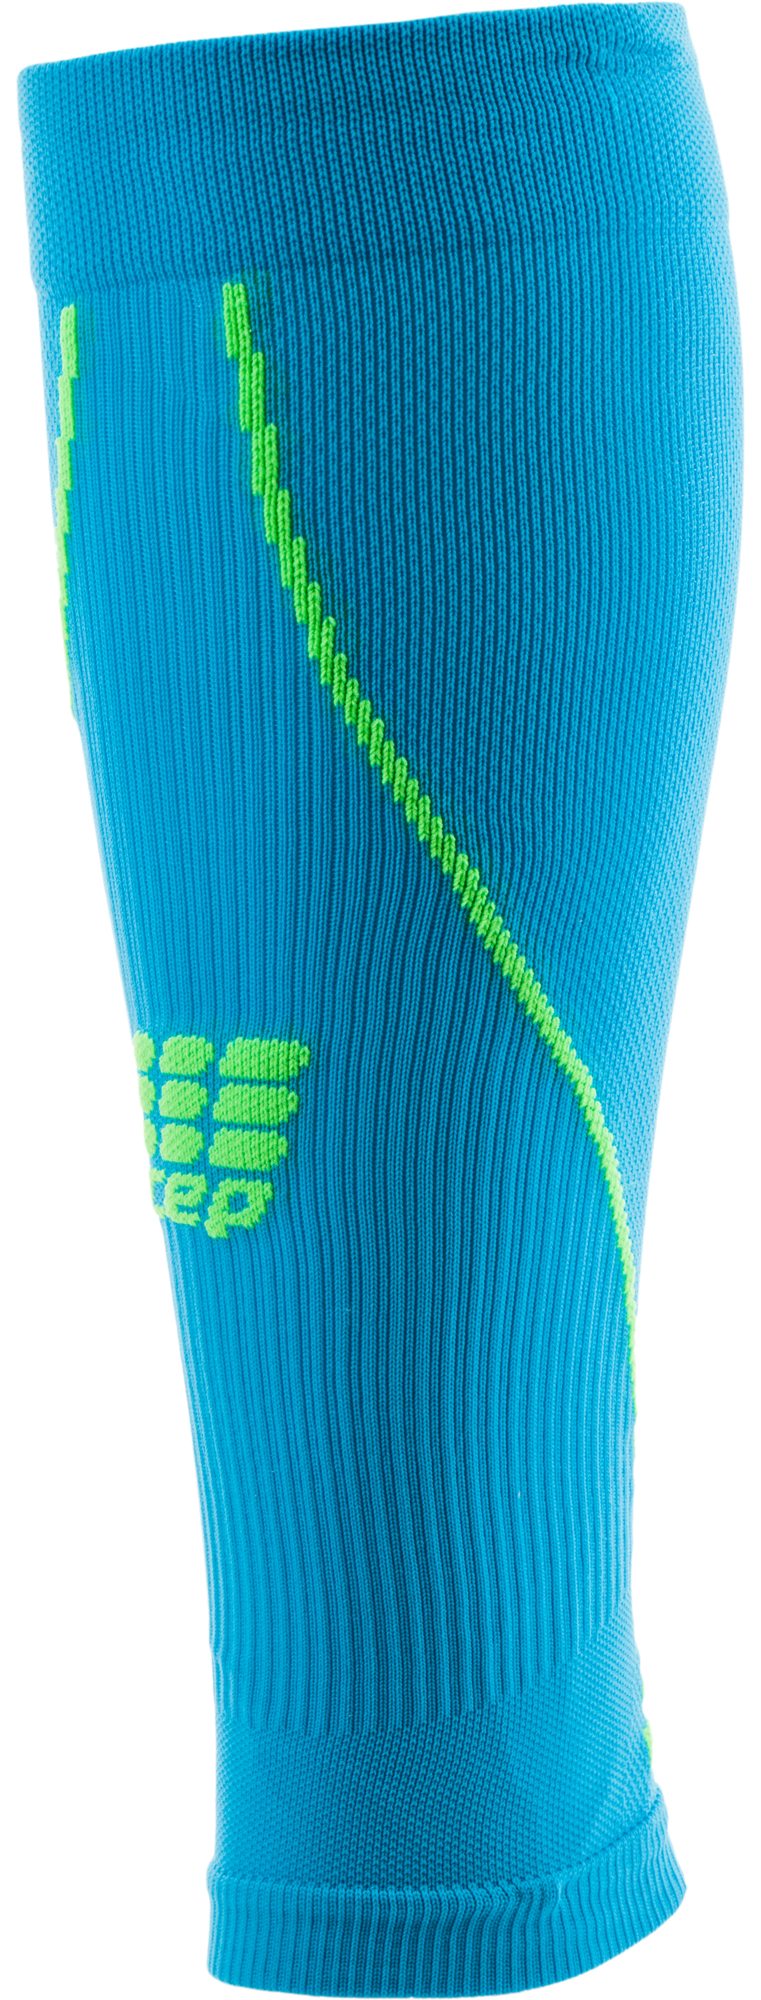 CEP Гетры мужские CEP progressive+ calf sleeves 2.0, 1 пара цена 2017